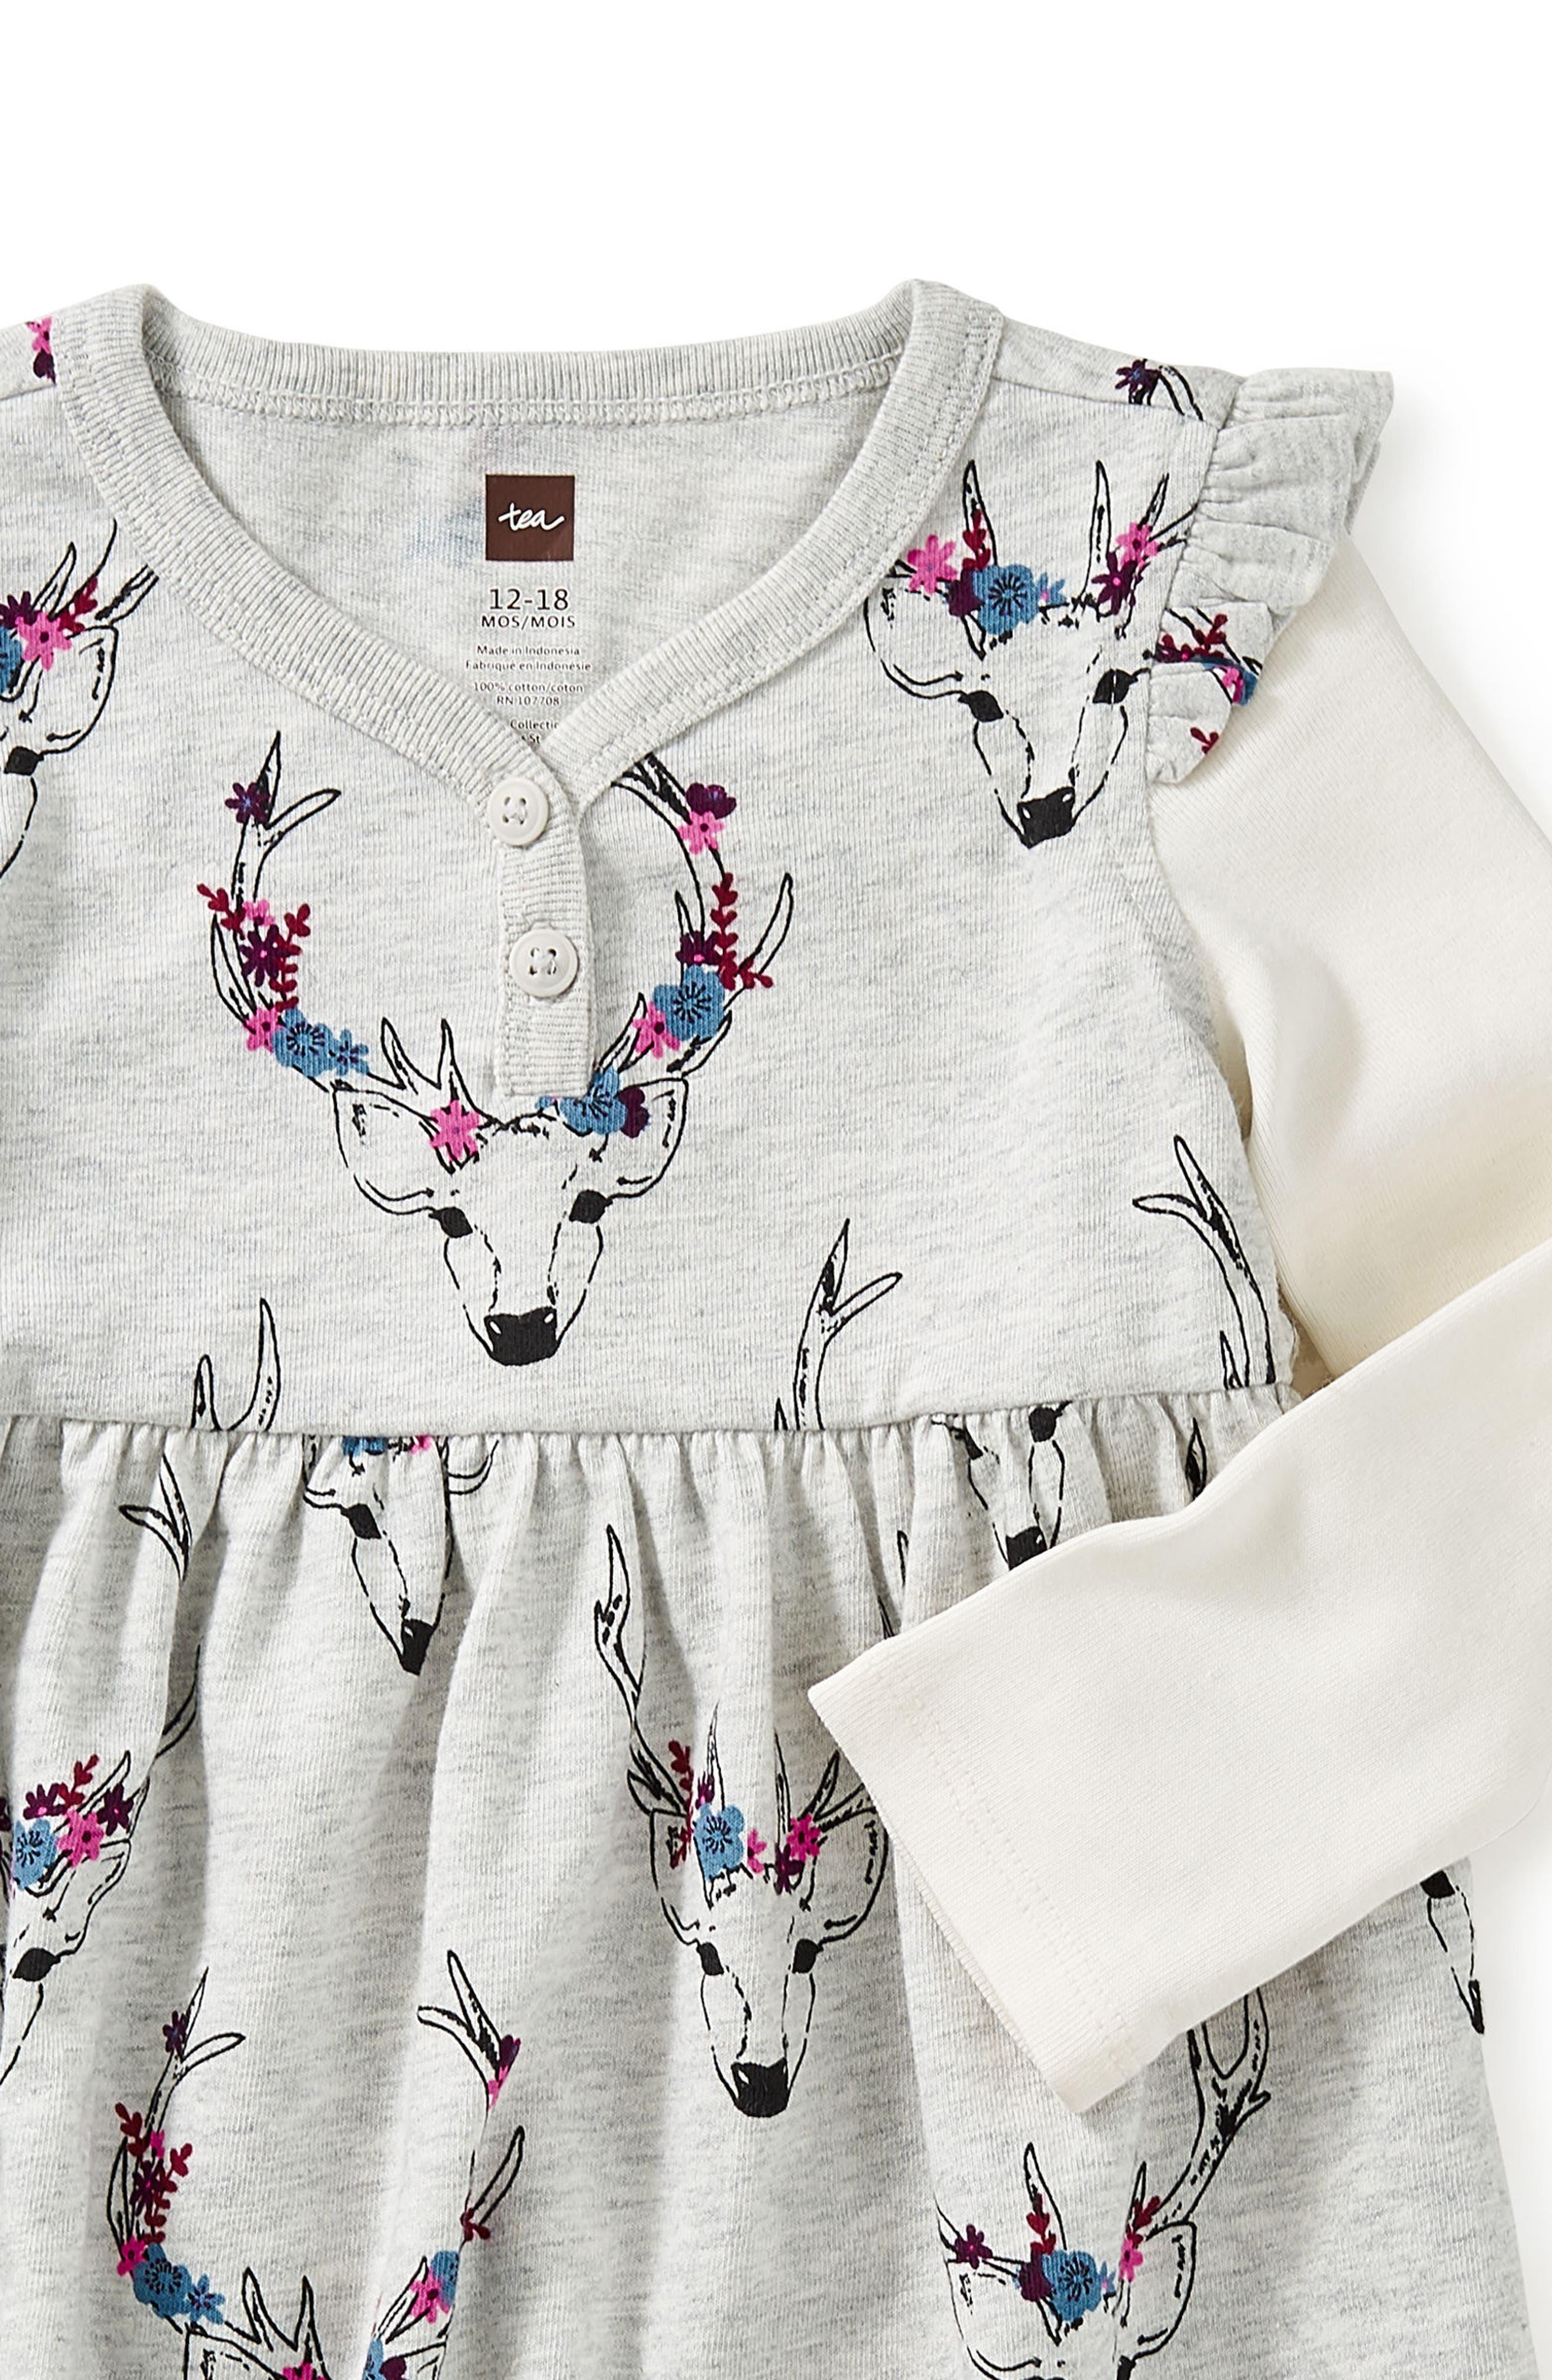 Oh Deer Layered Henley Dress,                             Alternate thumbnail 2, color,                             020